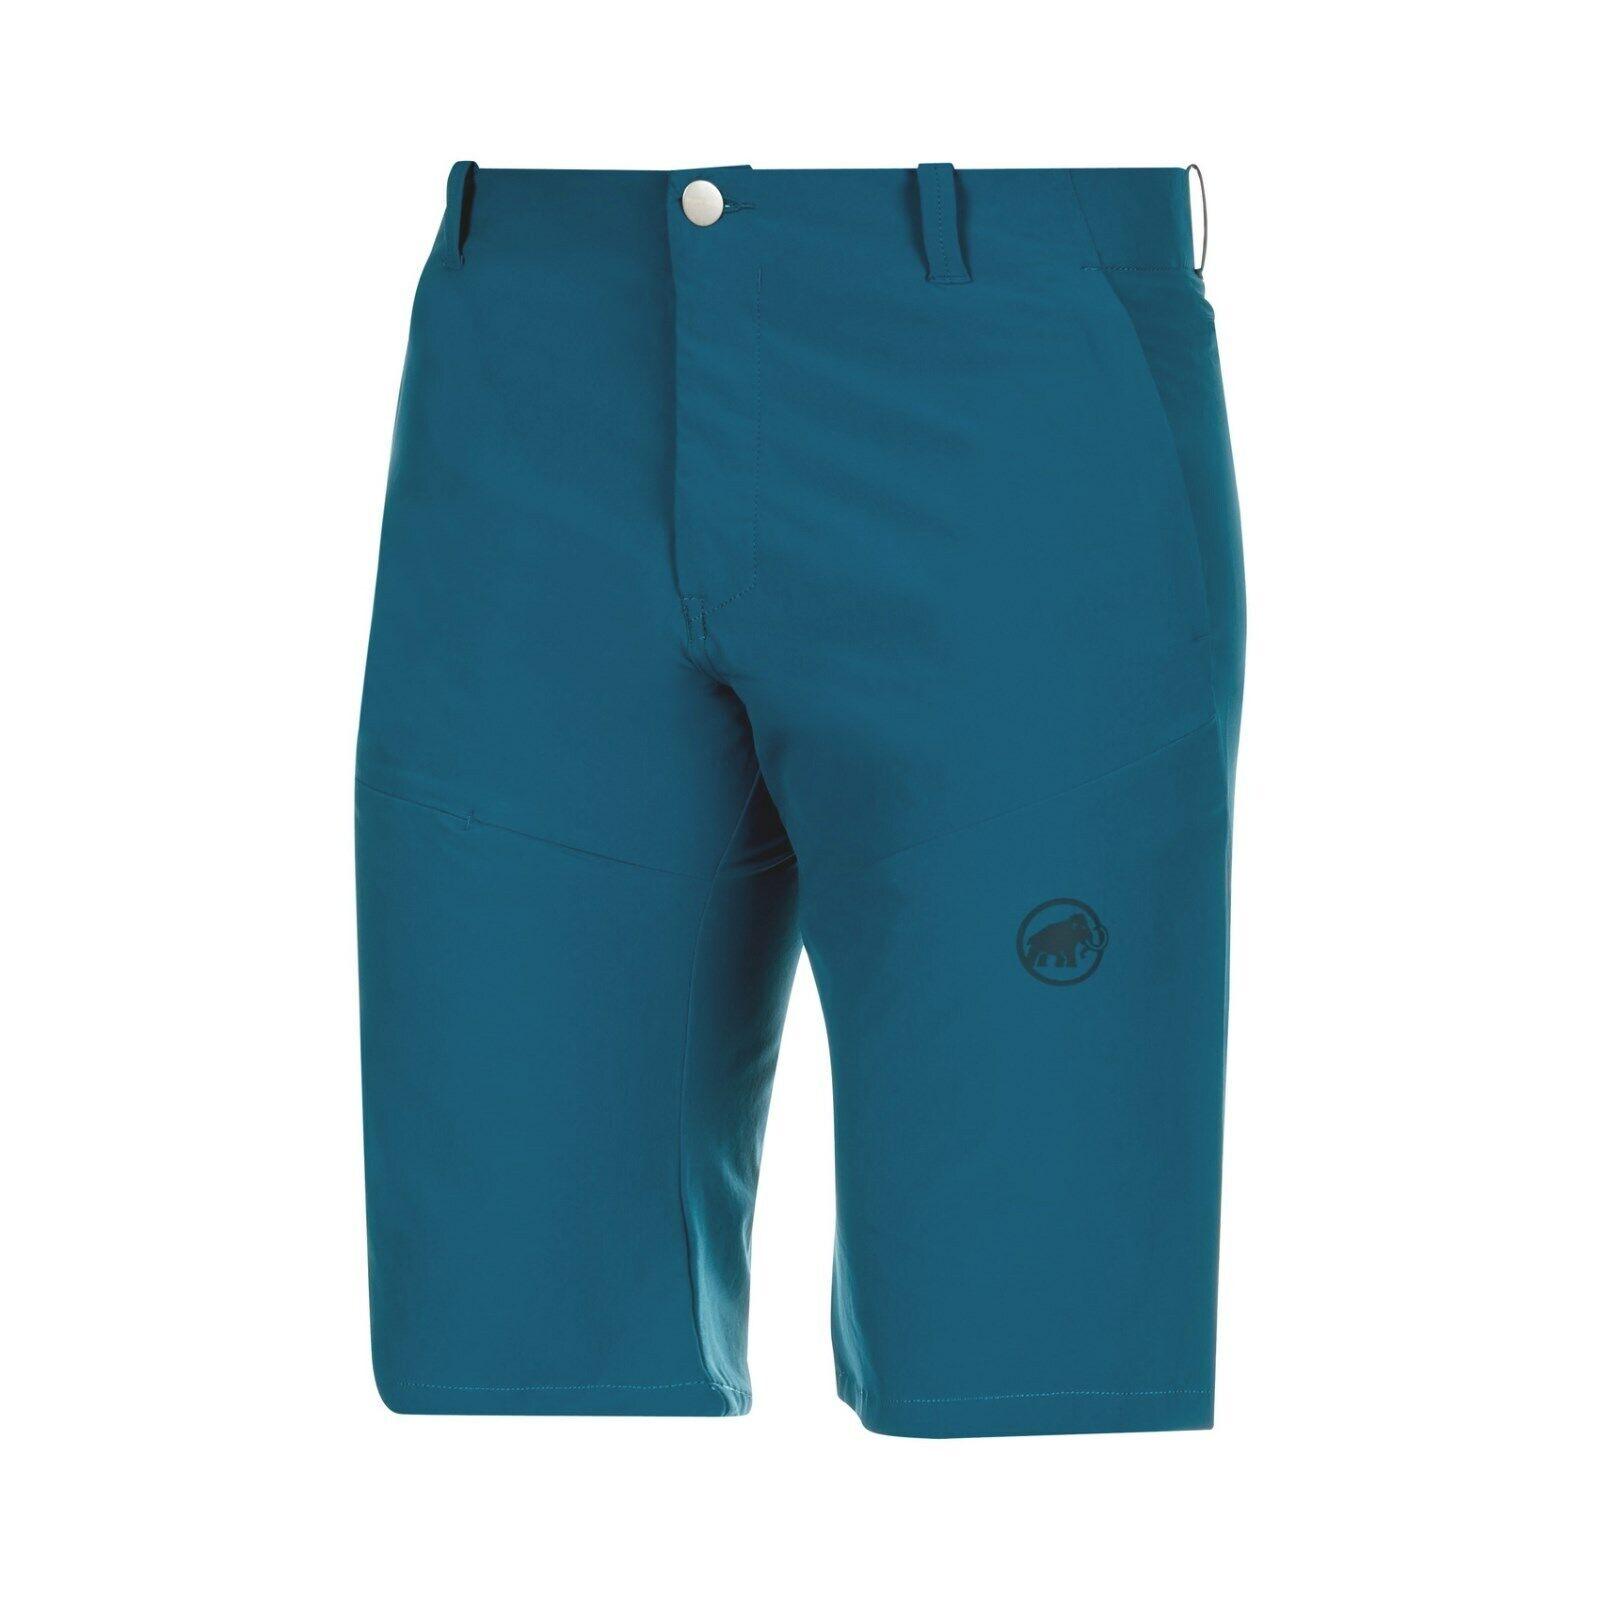 Mammut señores breve wanderhose runbold shorts Man condición física-fit Mammut  nuevo